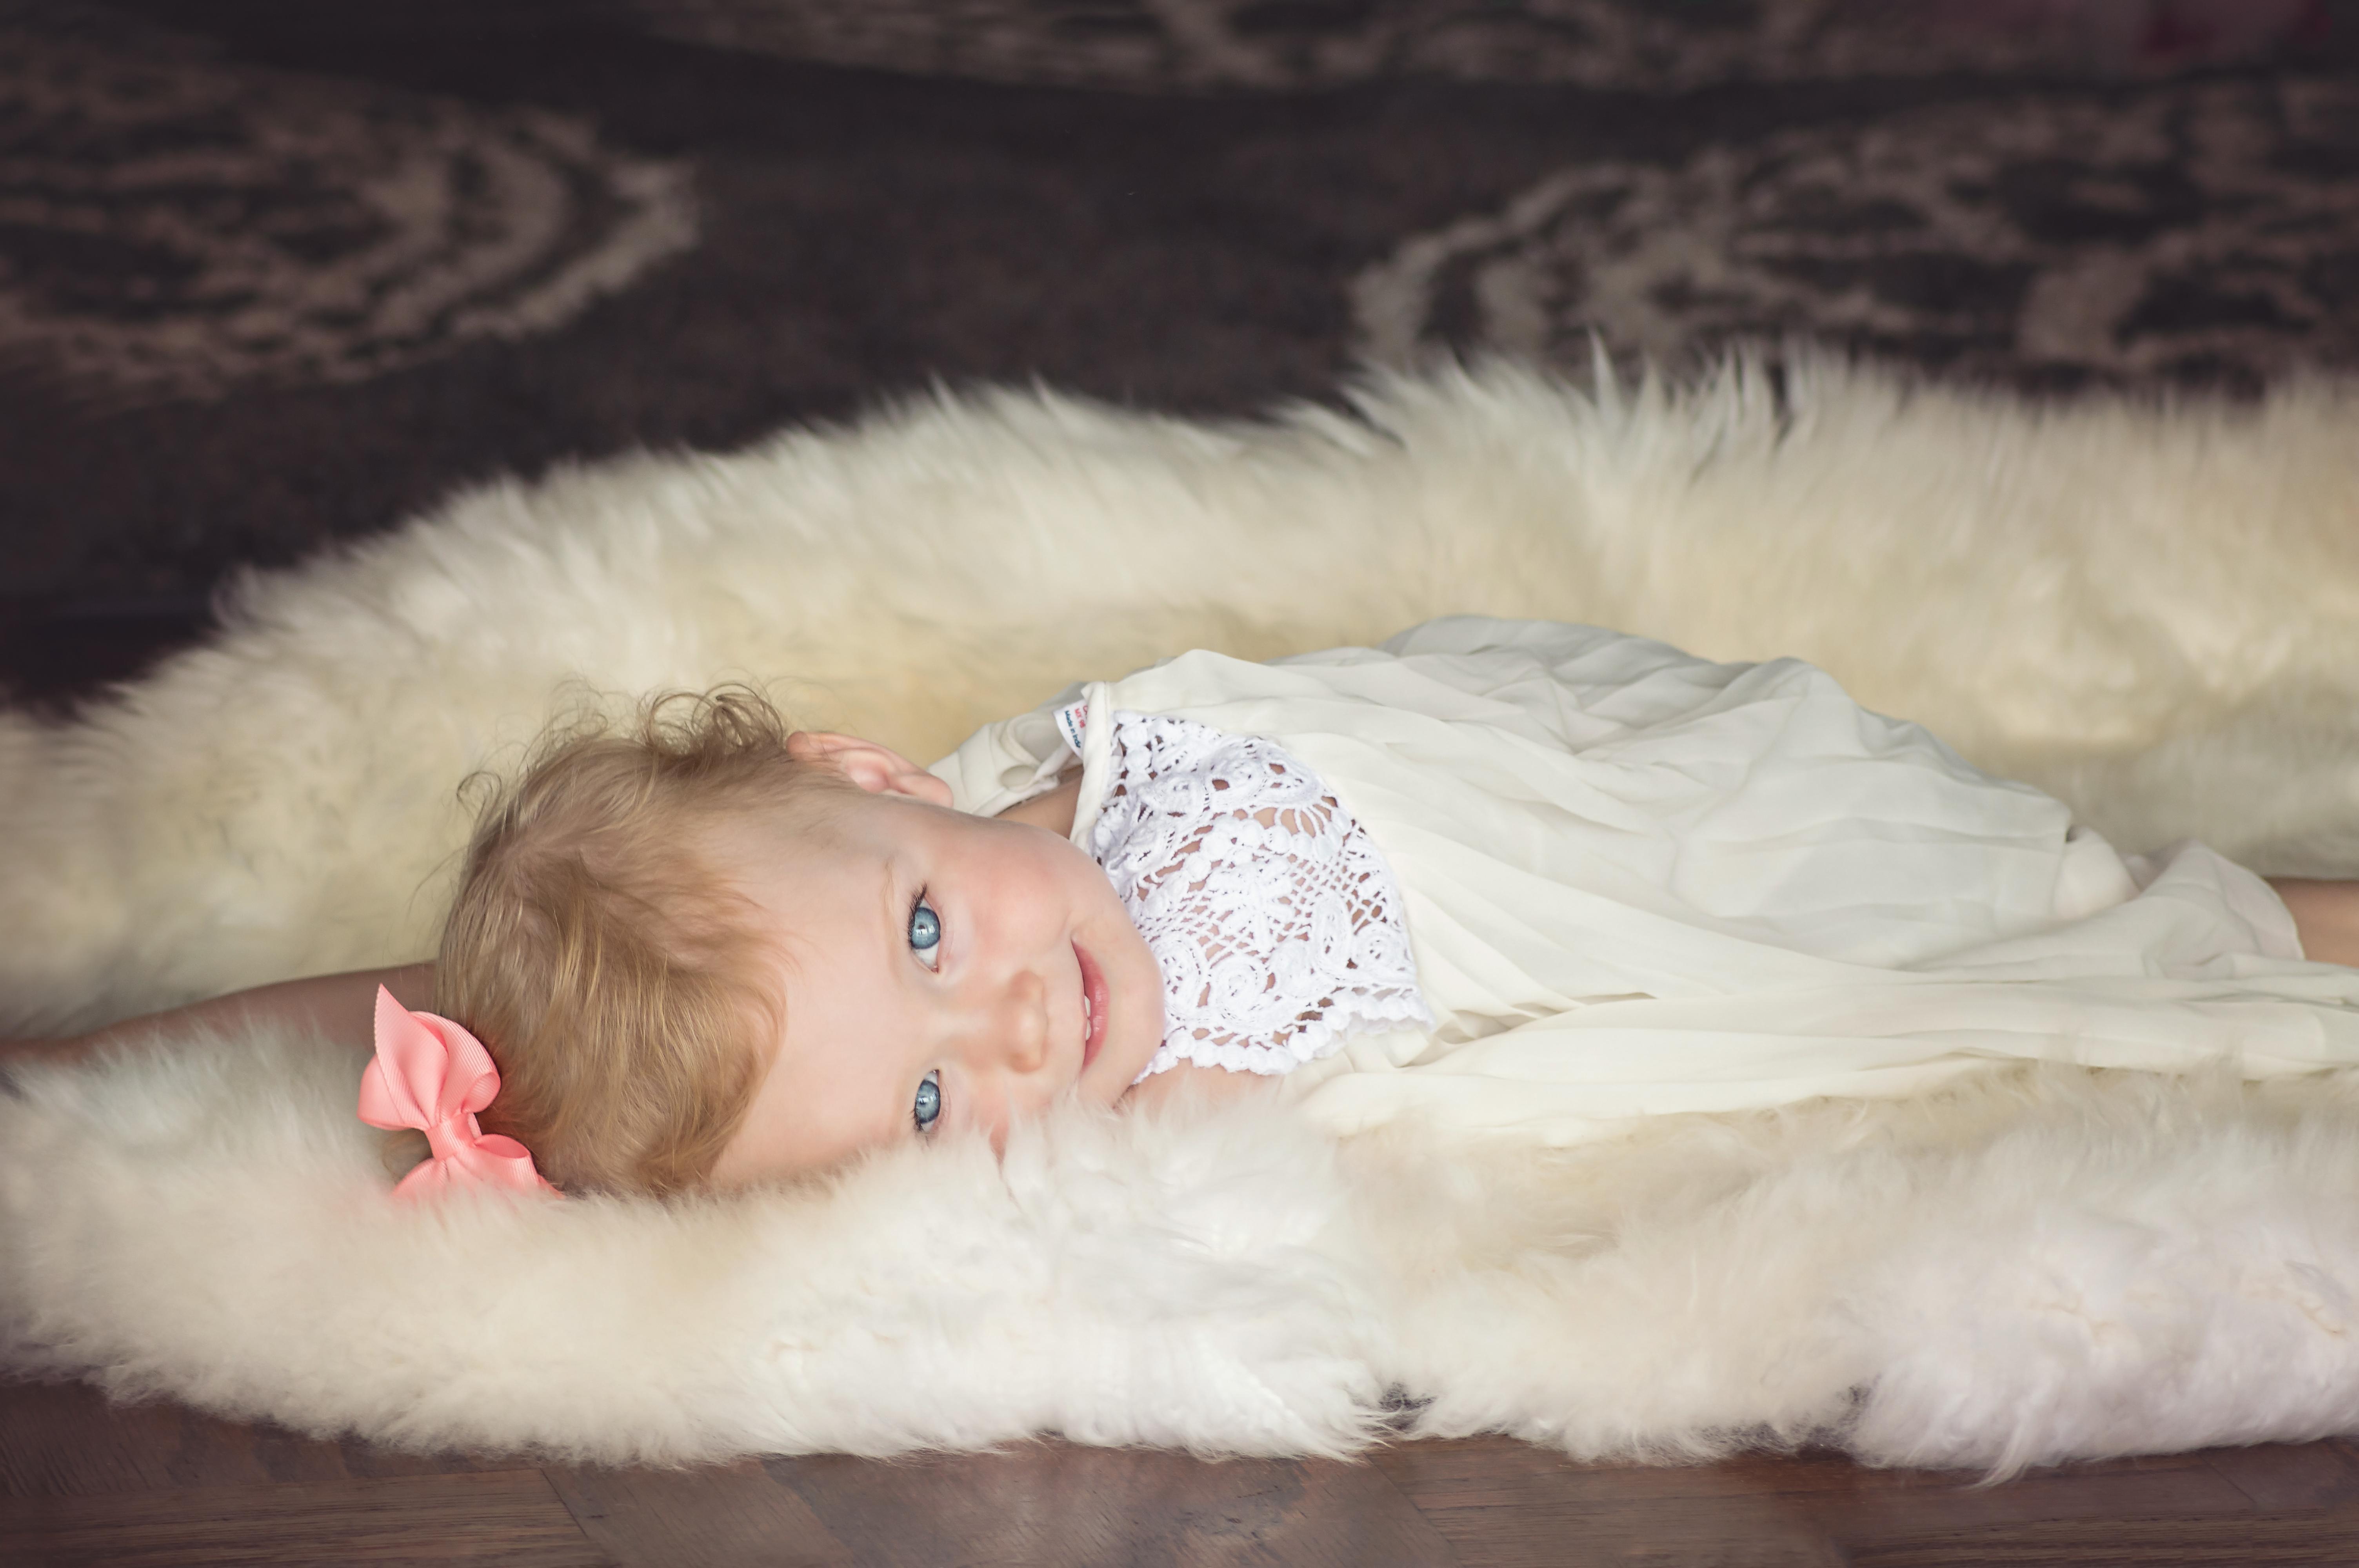 Toddler Sleep Training Services | The Peaceful Sleeper